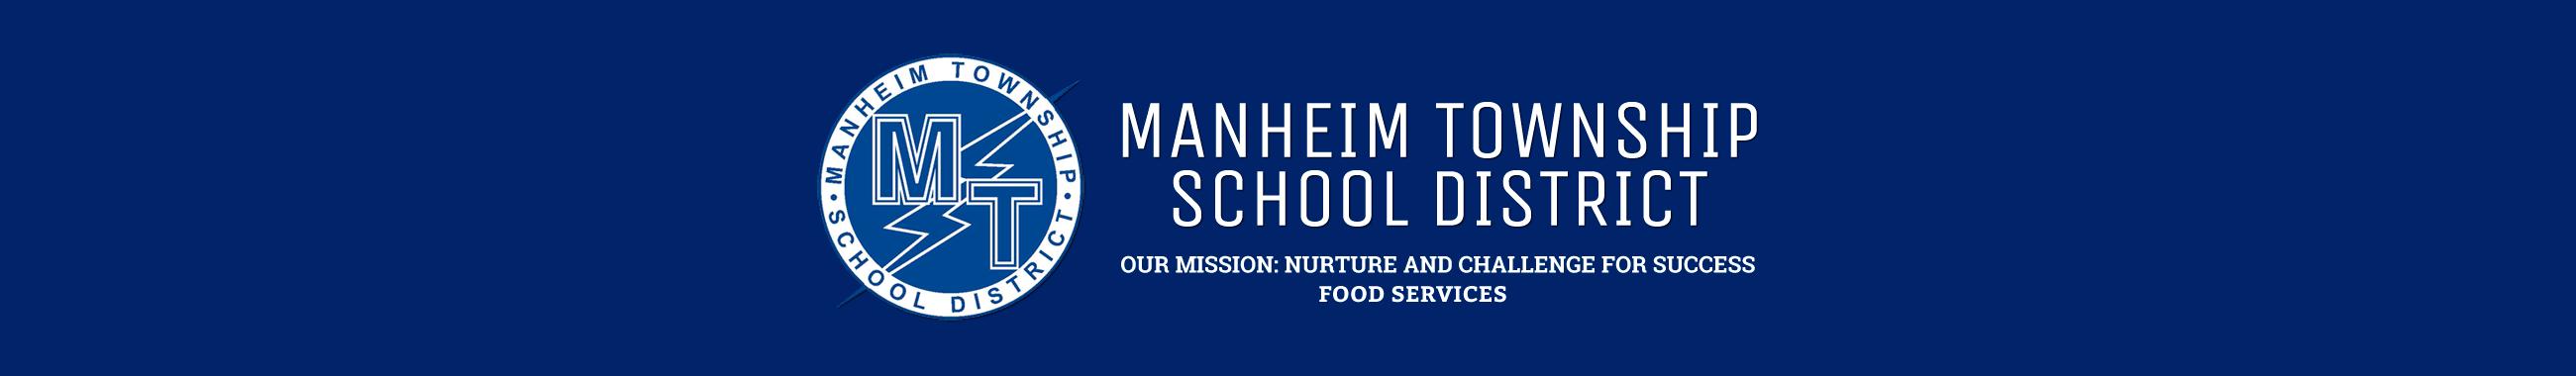 Manheim Township School District – School Nutrition And Fitness With Regard To Manheim Township School District Calendar